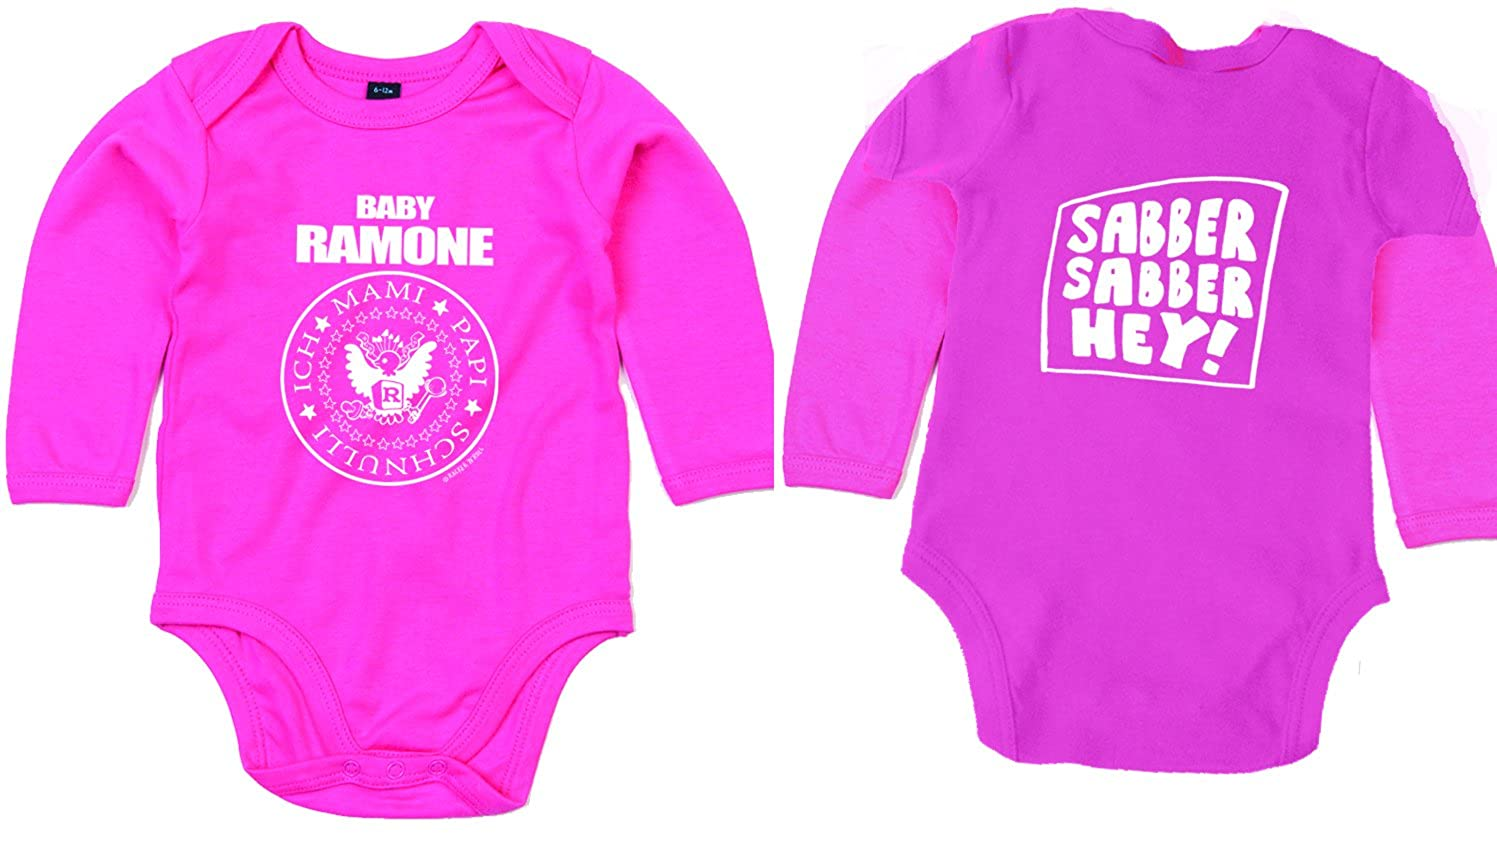 BABY RAMONE Sabber Hey Langarm Body BIO-Baumwolle pink